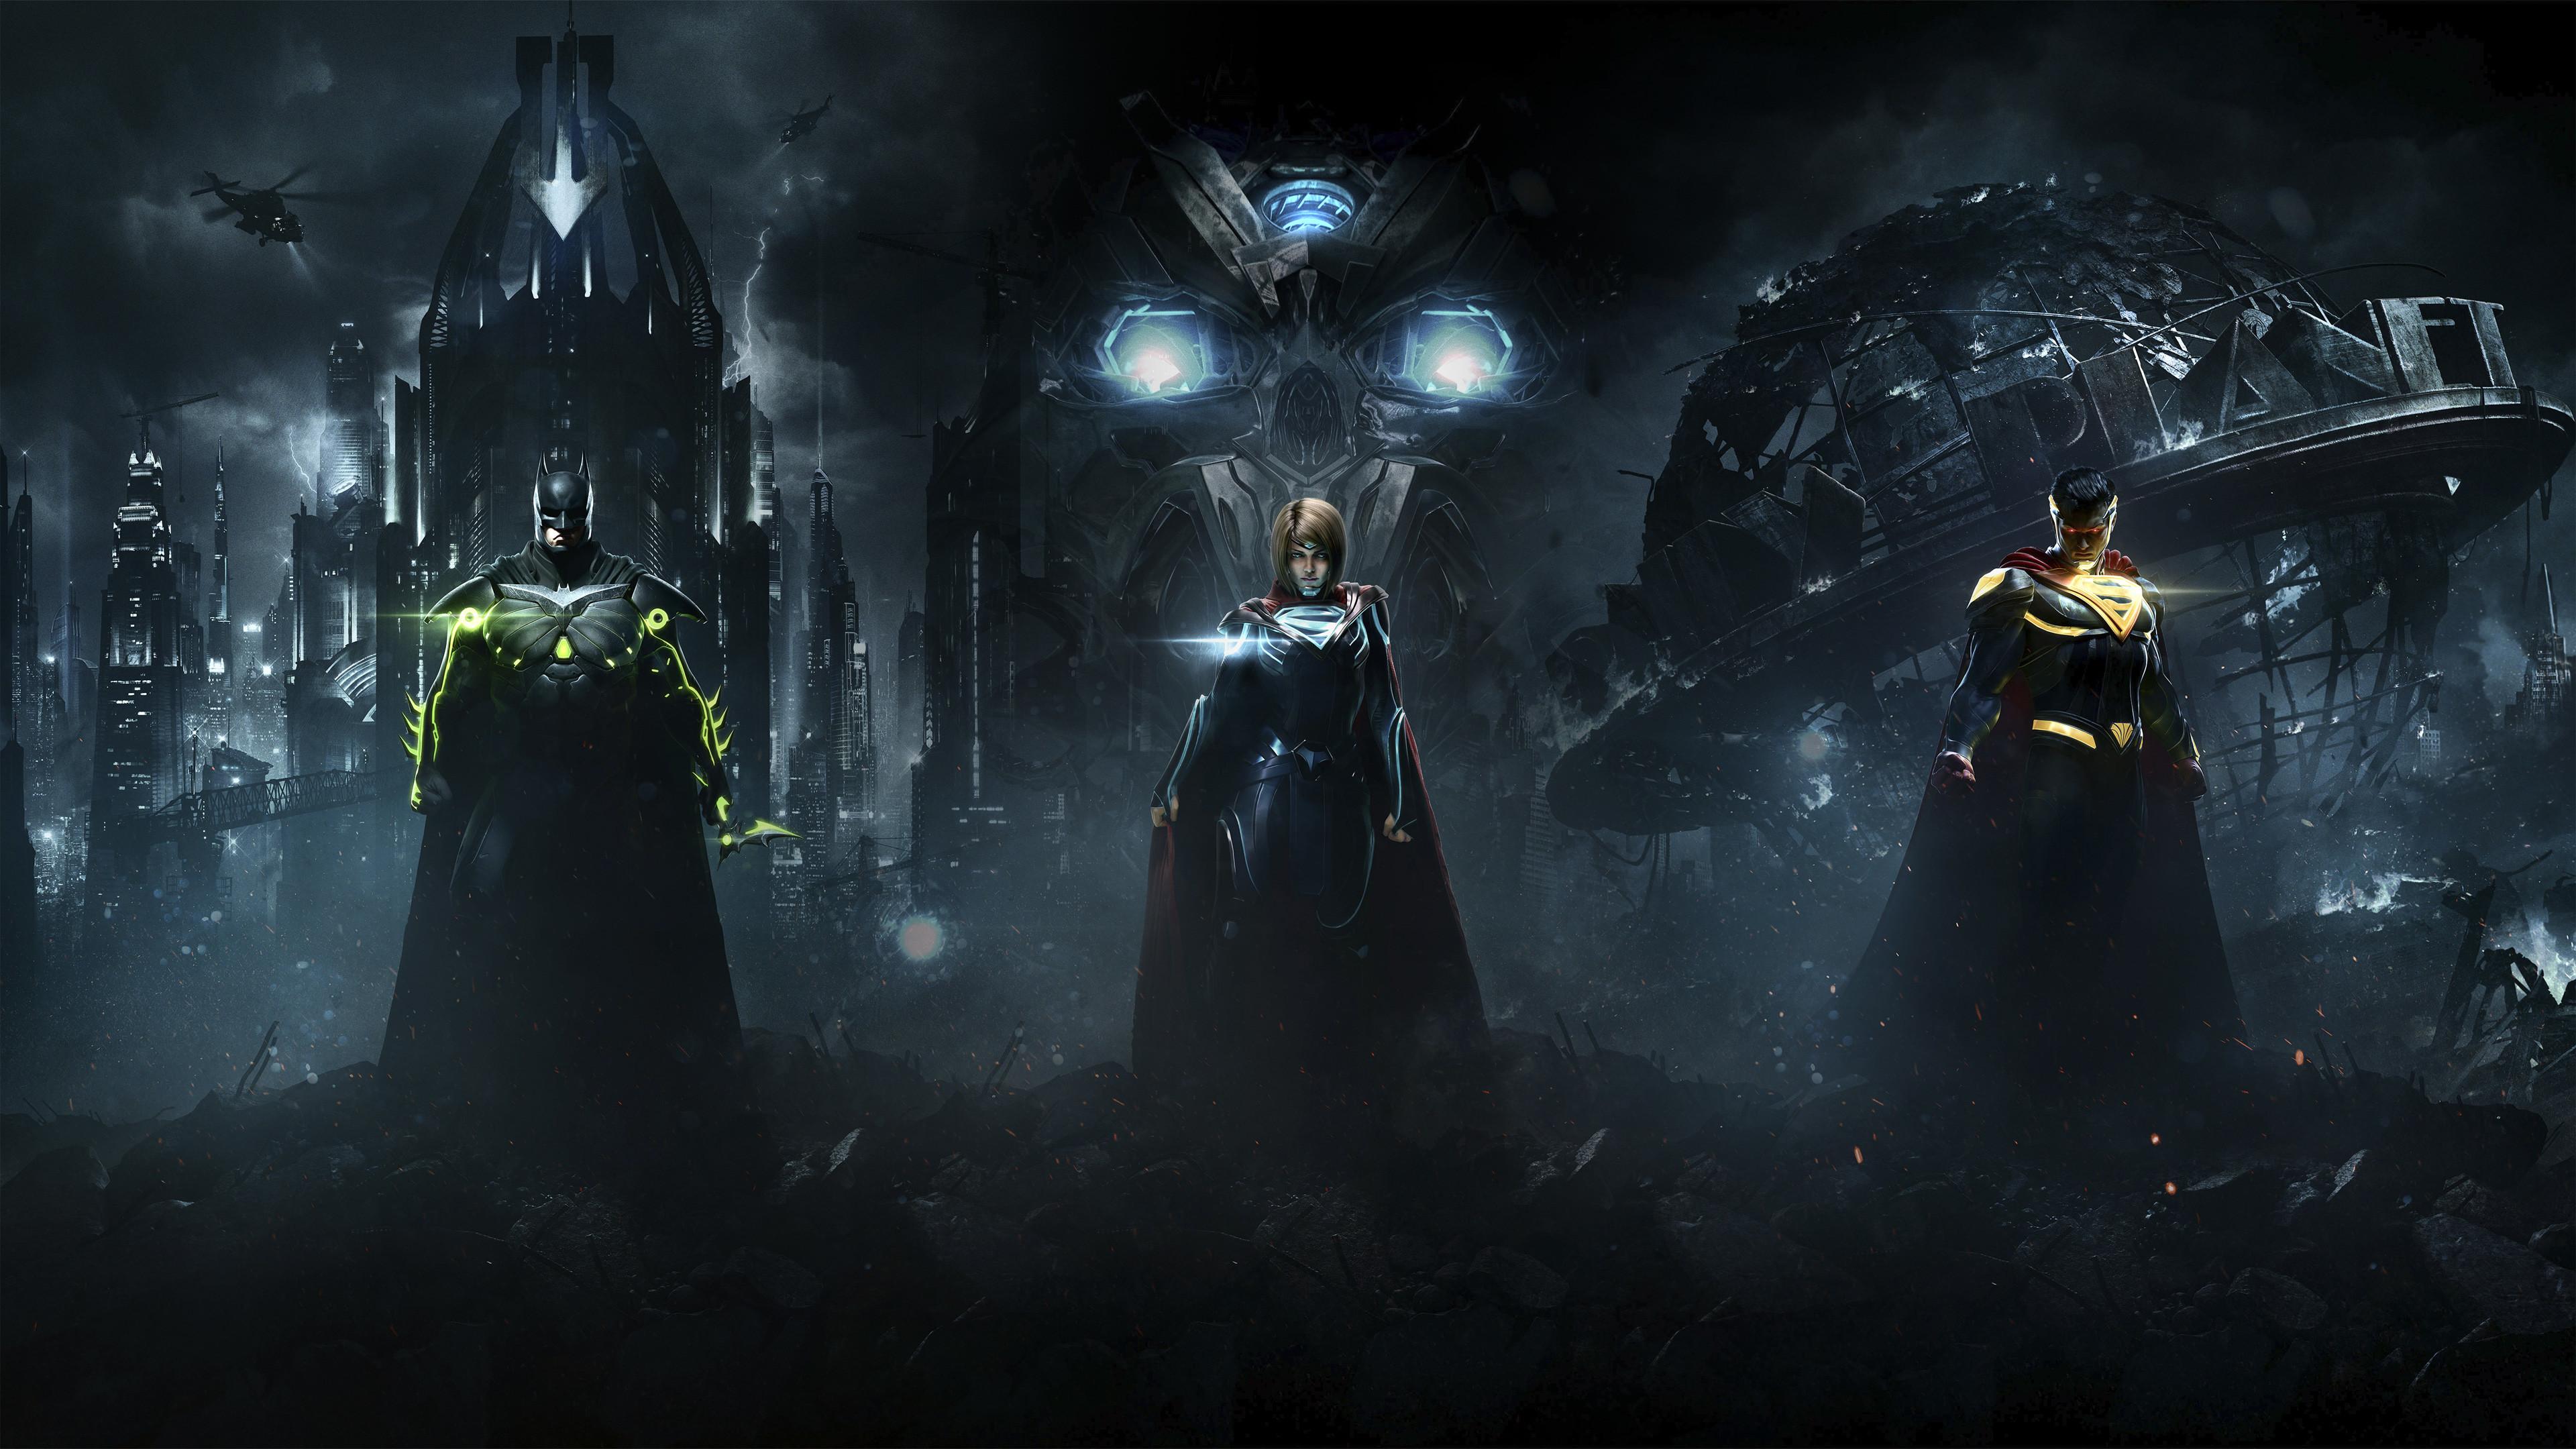 3840x2160 Injustice 2 Superman Supergirl Batman Combine Injustice 2 3840x2160 Wallpaper Teahub Io